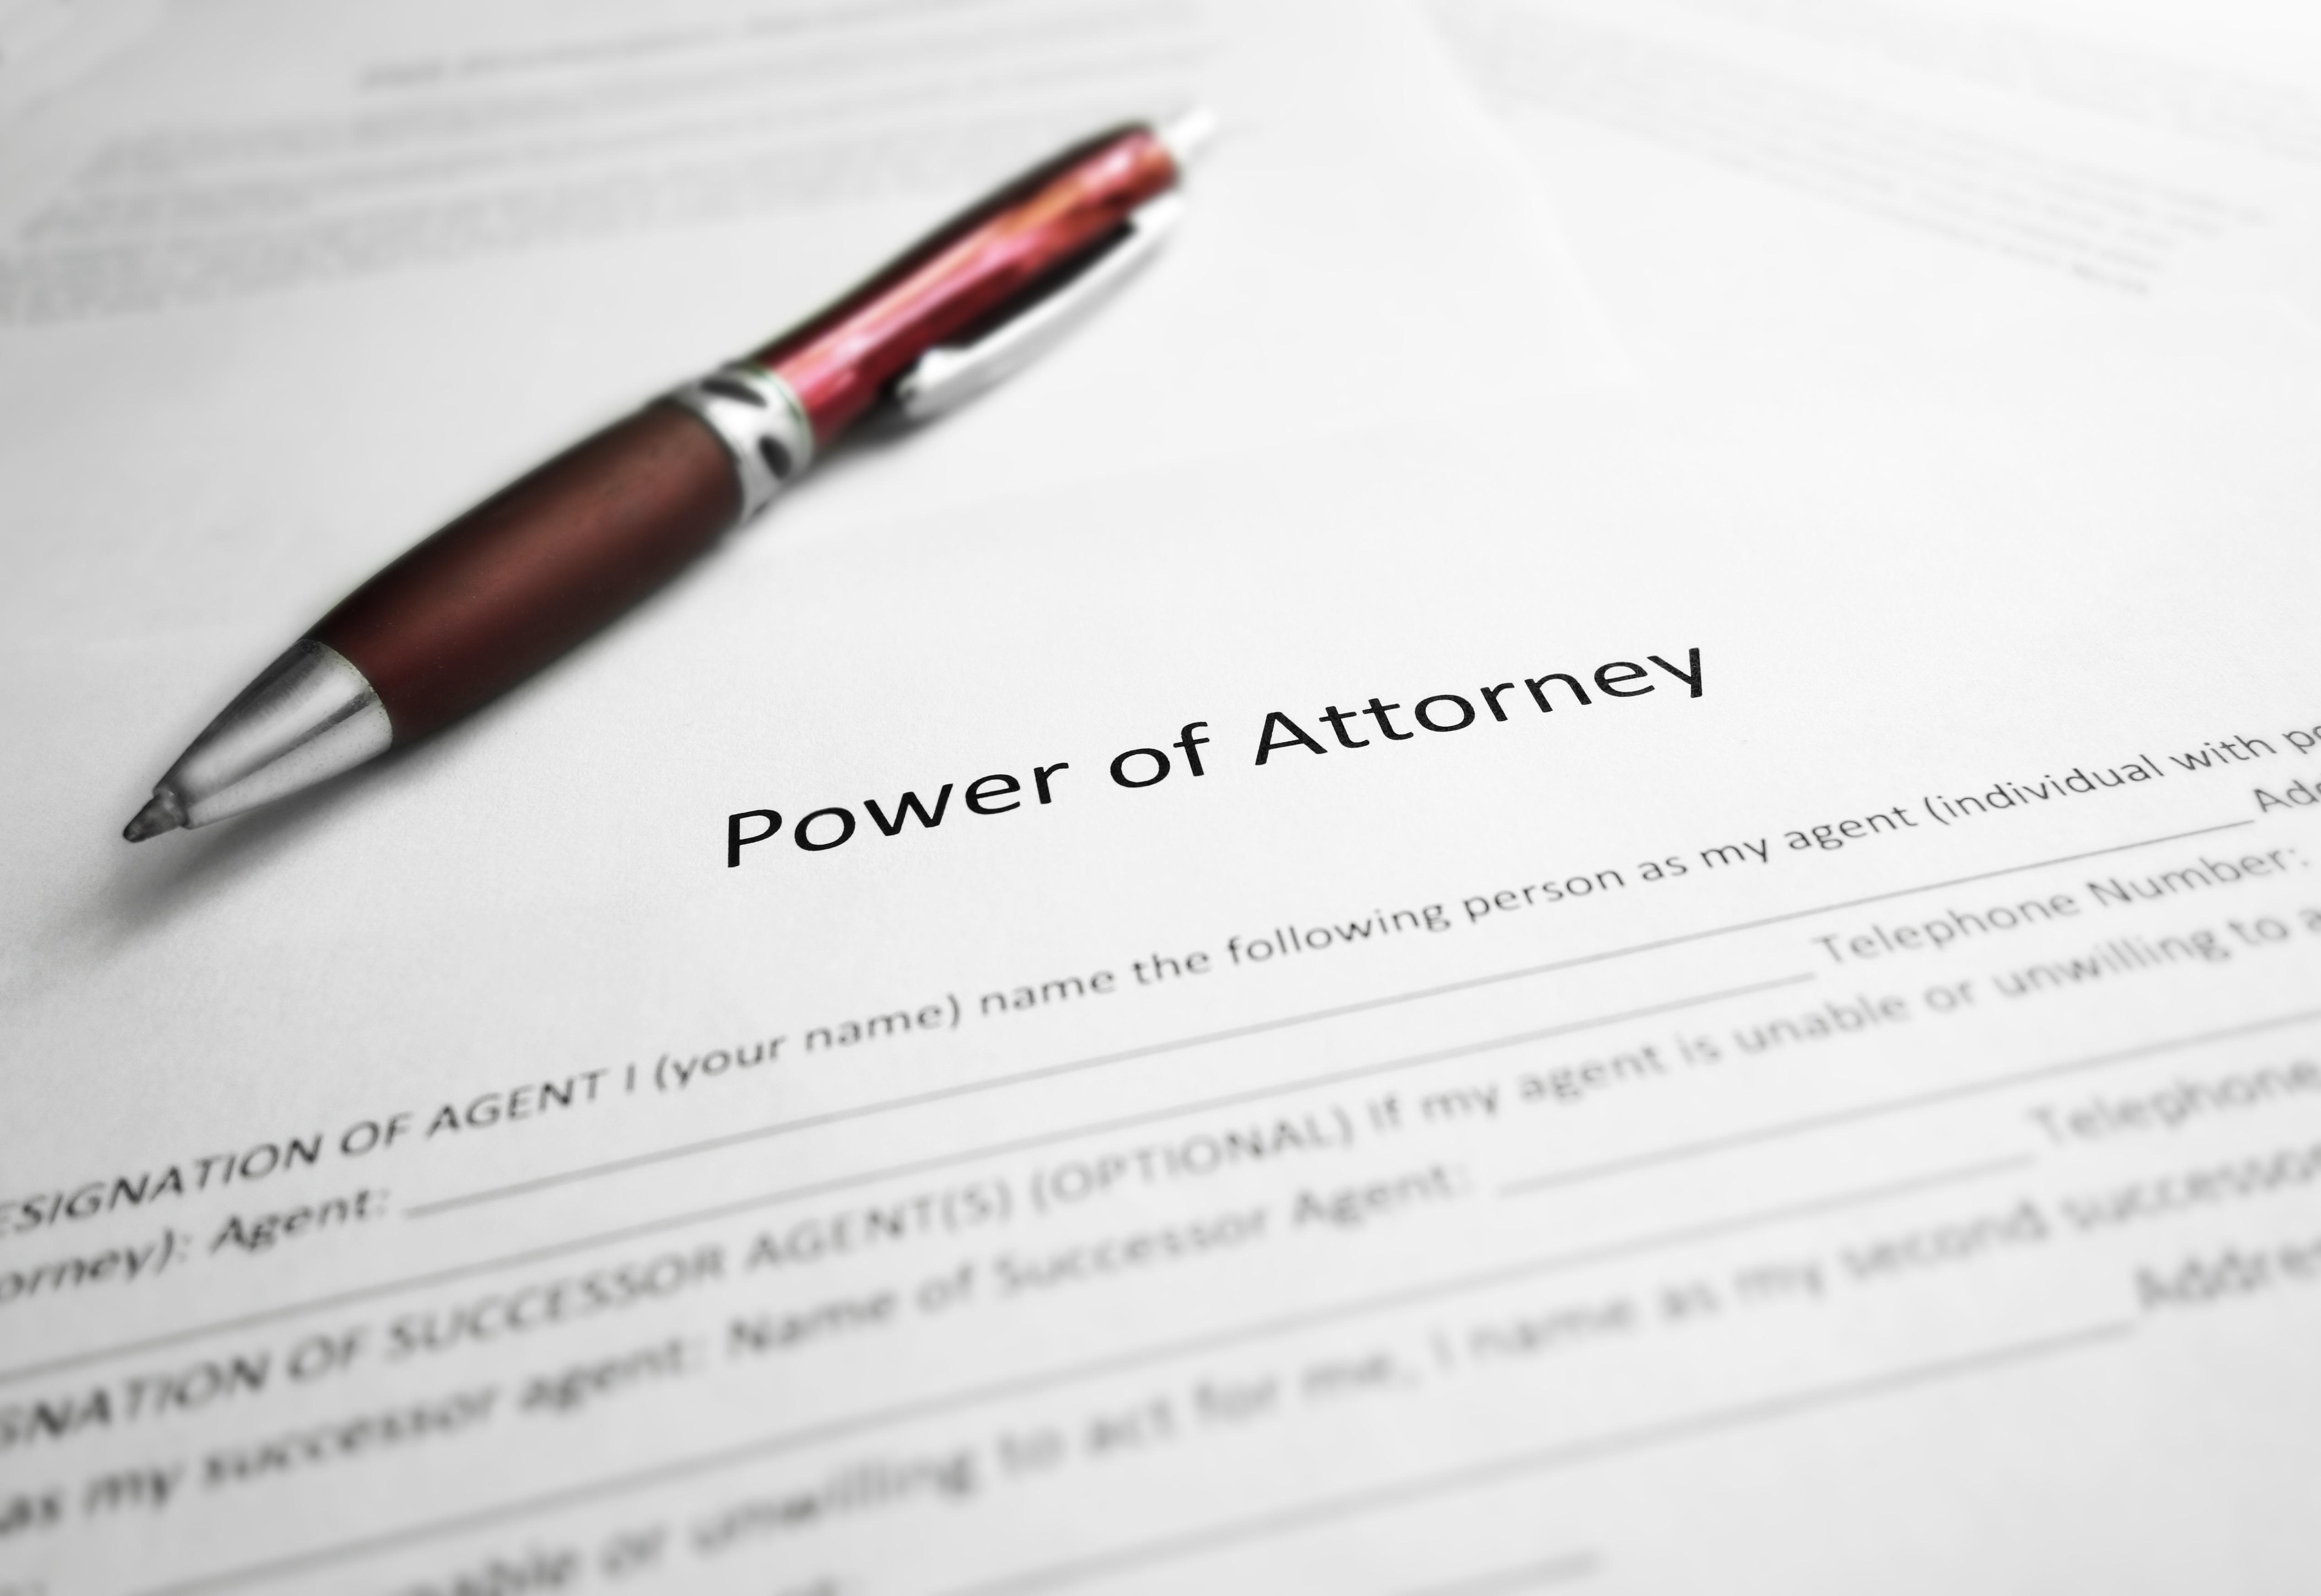 shutterstock_684639406 Power of Attorney Pen